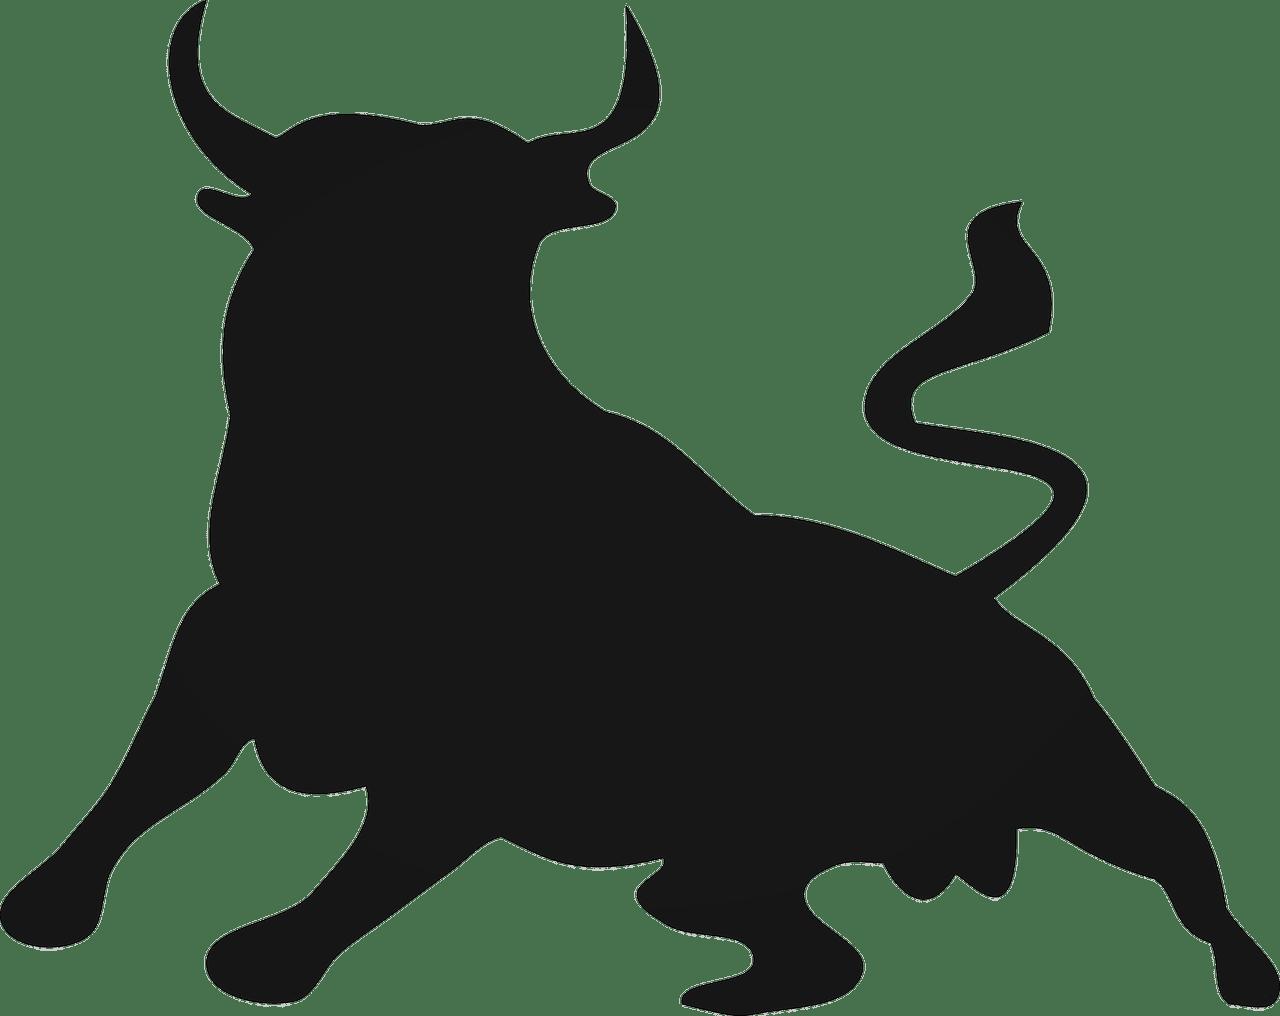 Taurofobia fobia a los toros